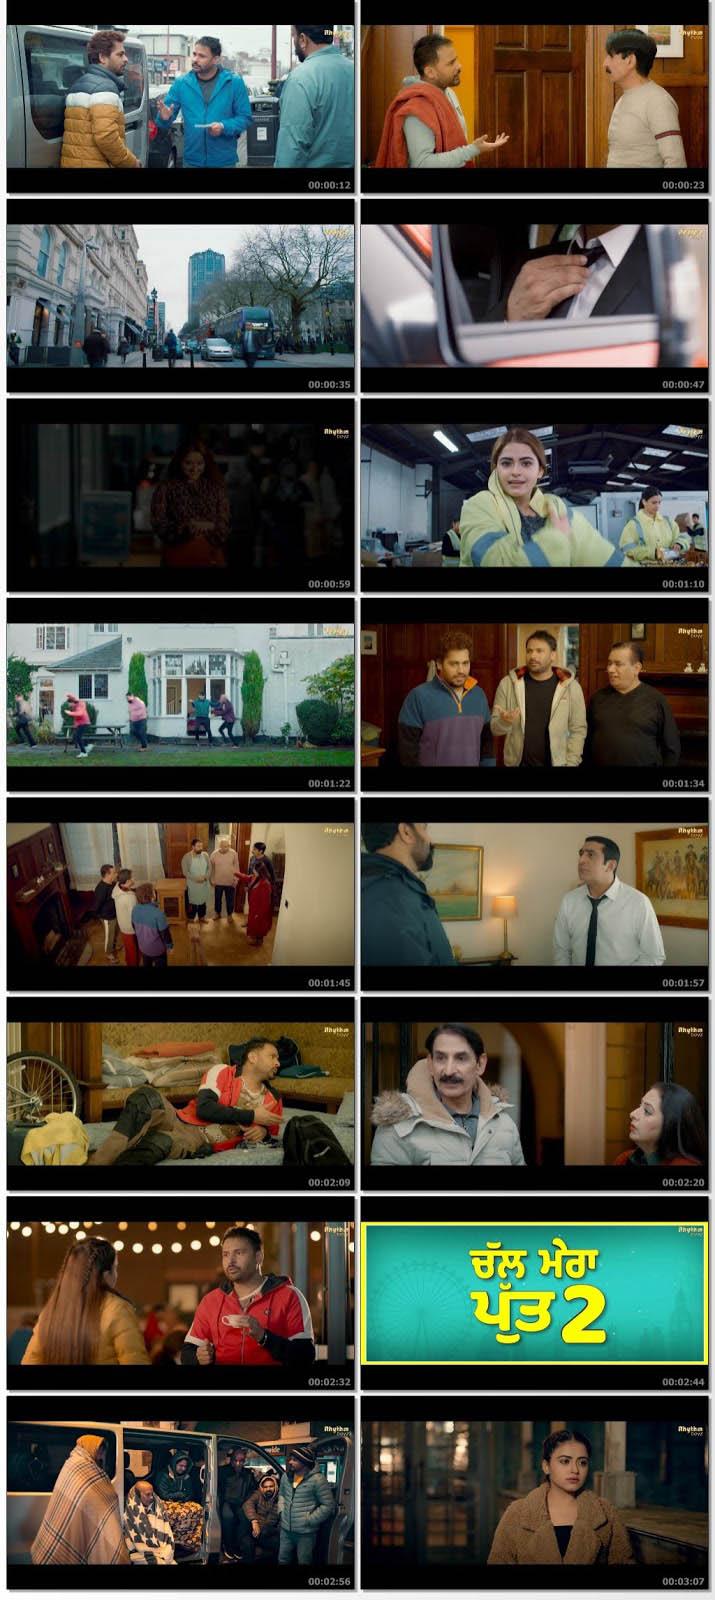 Chal mera putt 2 punjabi movie download filmywap, chal mera putt 2 full movie download bolly4u